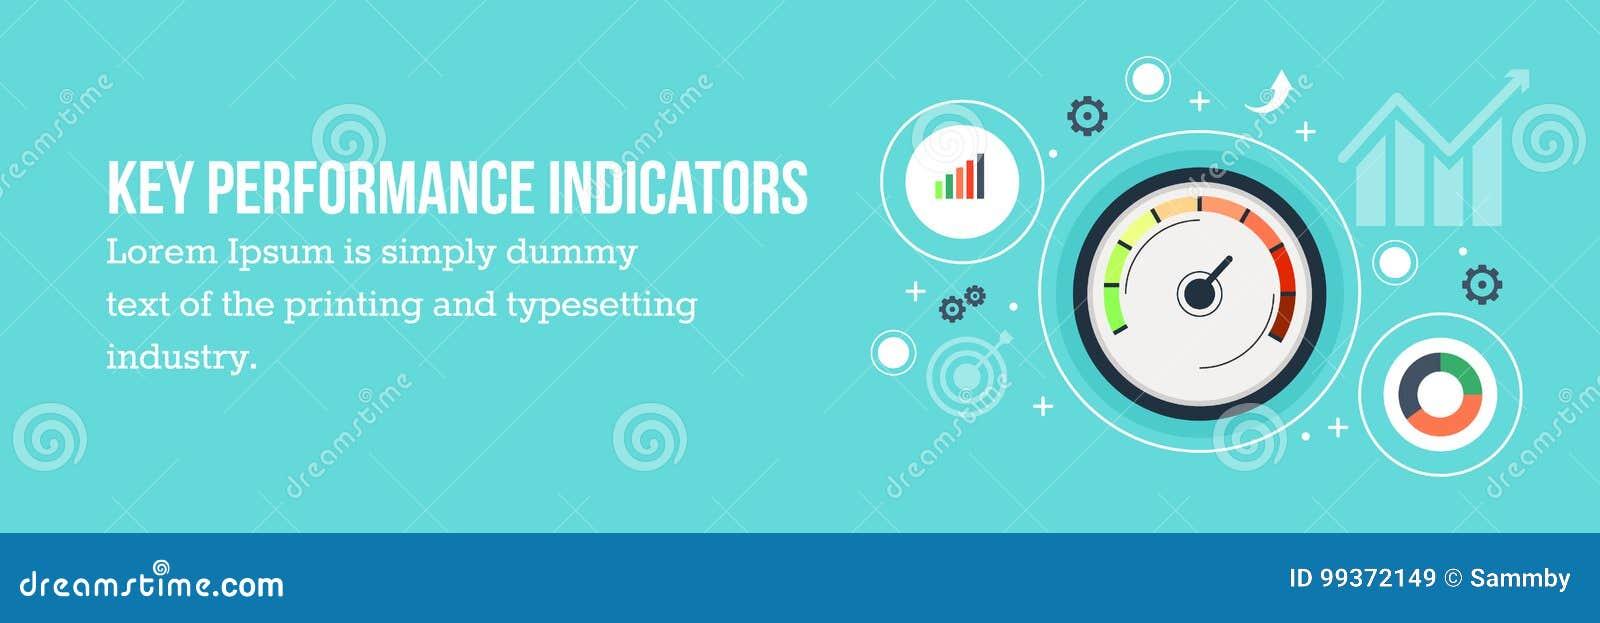 KPI - Key performance indicators flat design web banner.